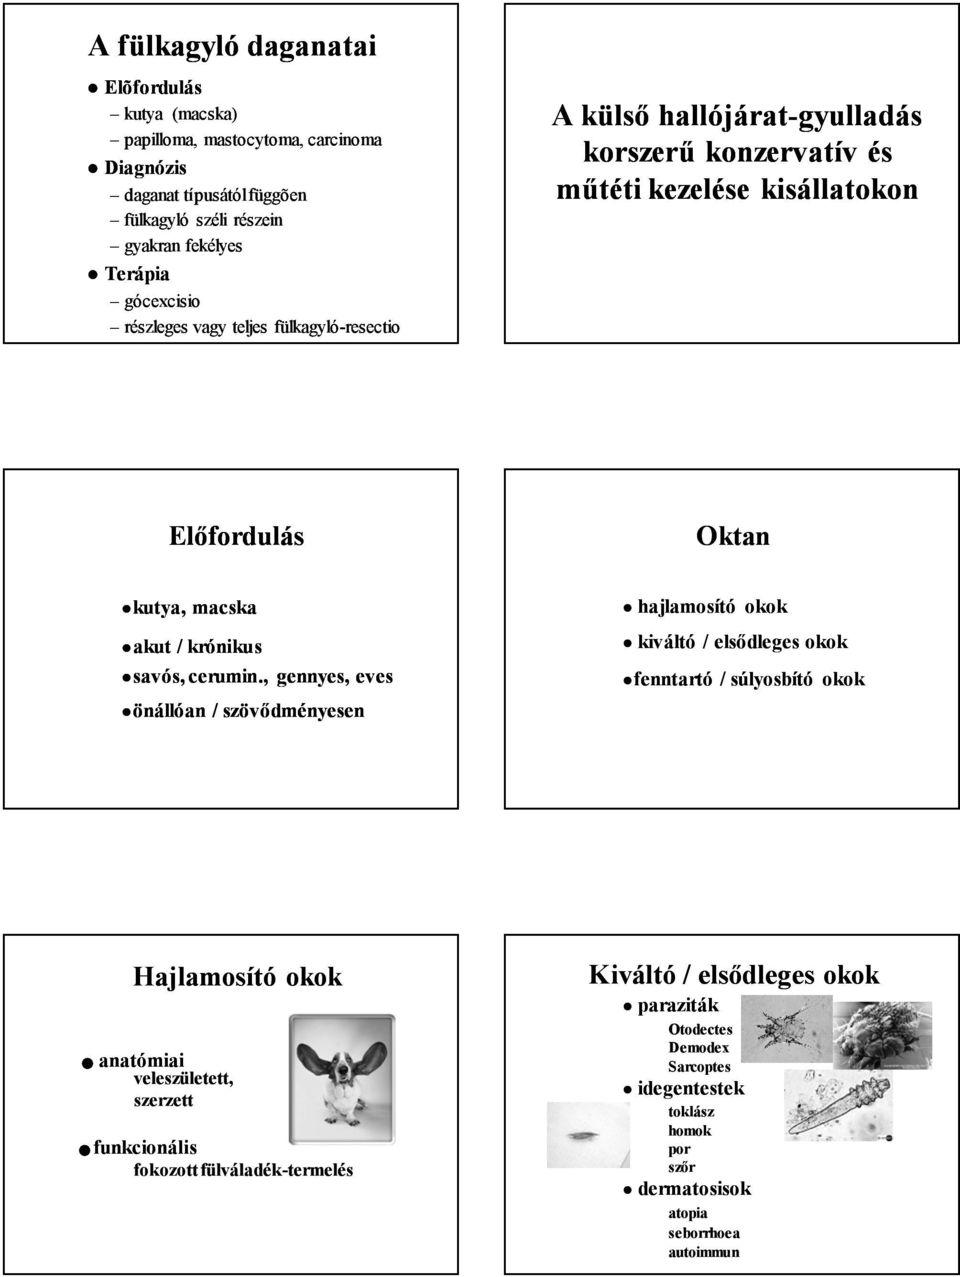 légúti papillómák)